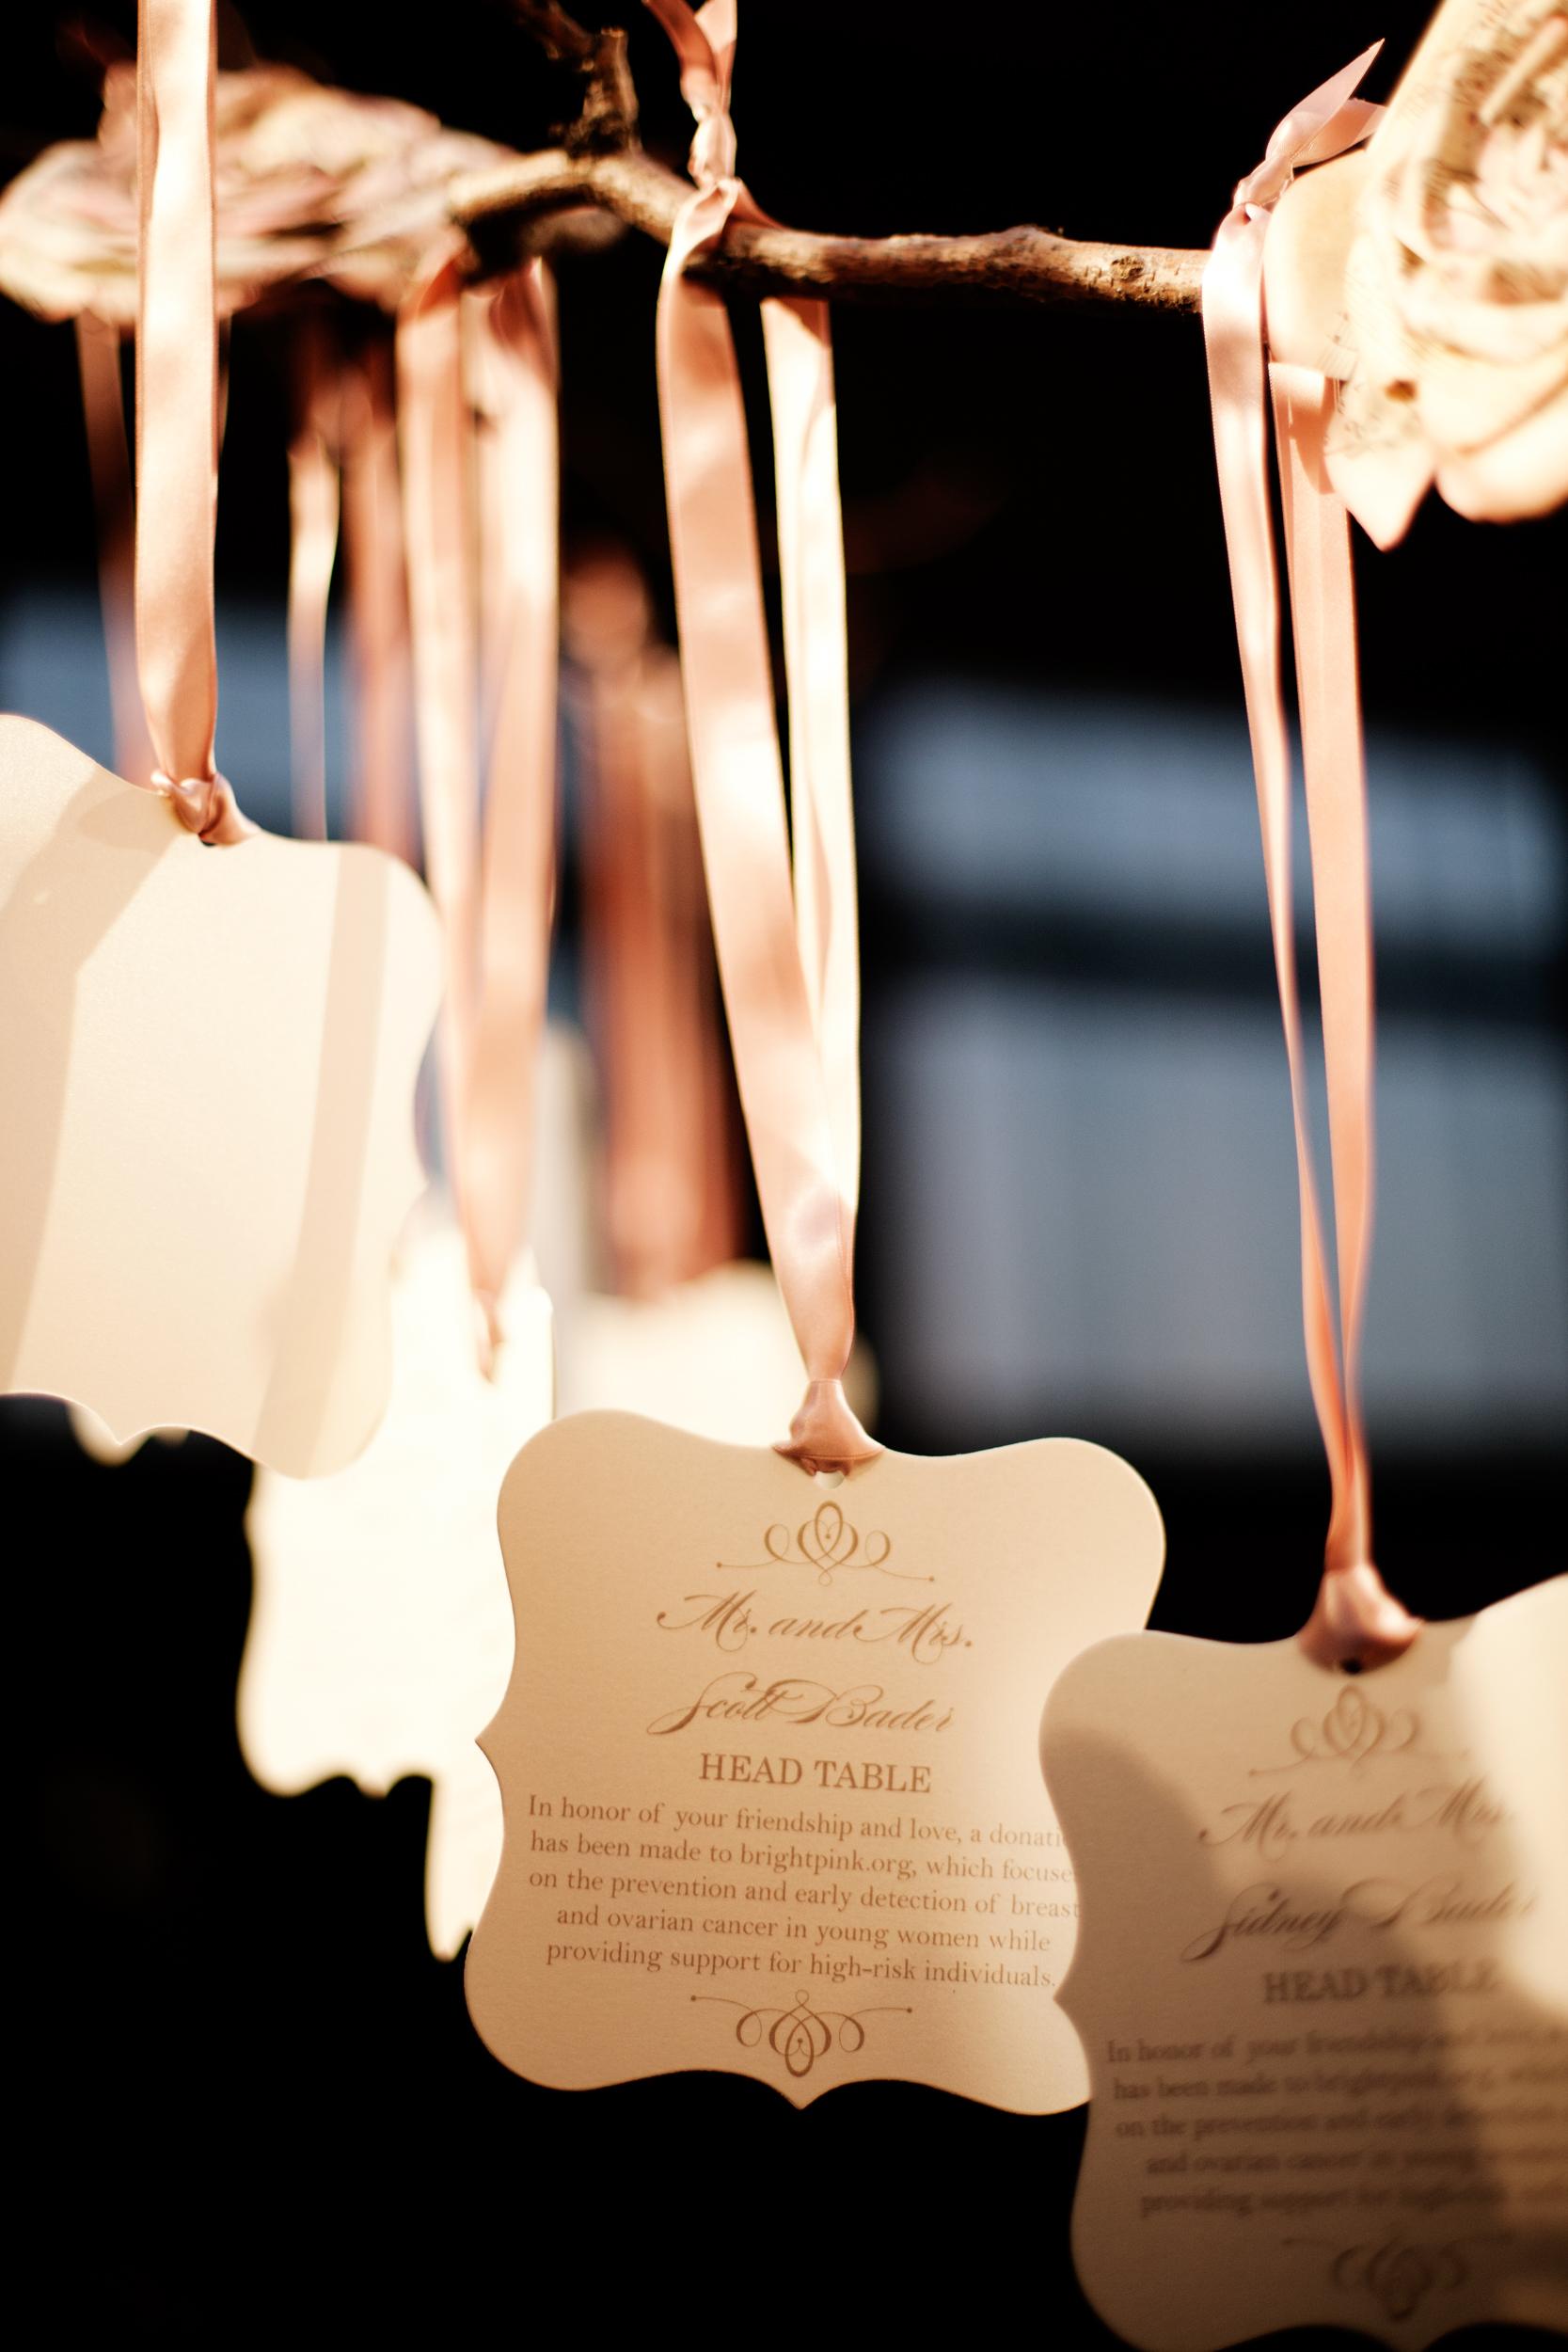 Ceci_New_York_Ceci_Style_Ceci_Johnson_Luxury_Lifestyle_Floral_Lace_Wedding_Letterpress_Inspiration_Design_Custom_Couture_Personalized_Invitations_-32.jpg